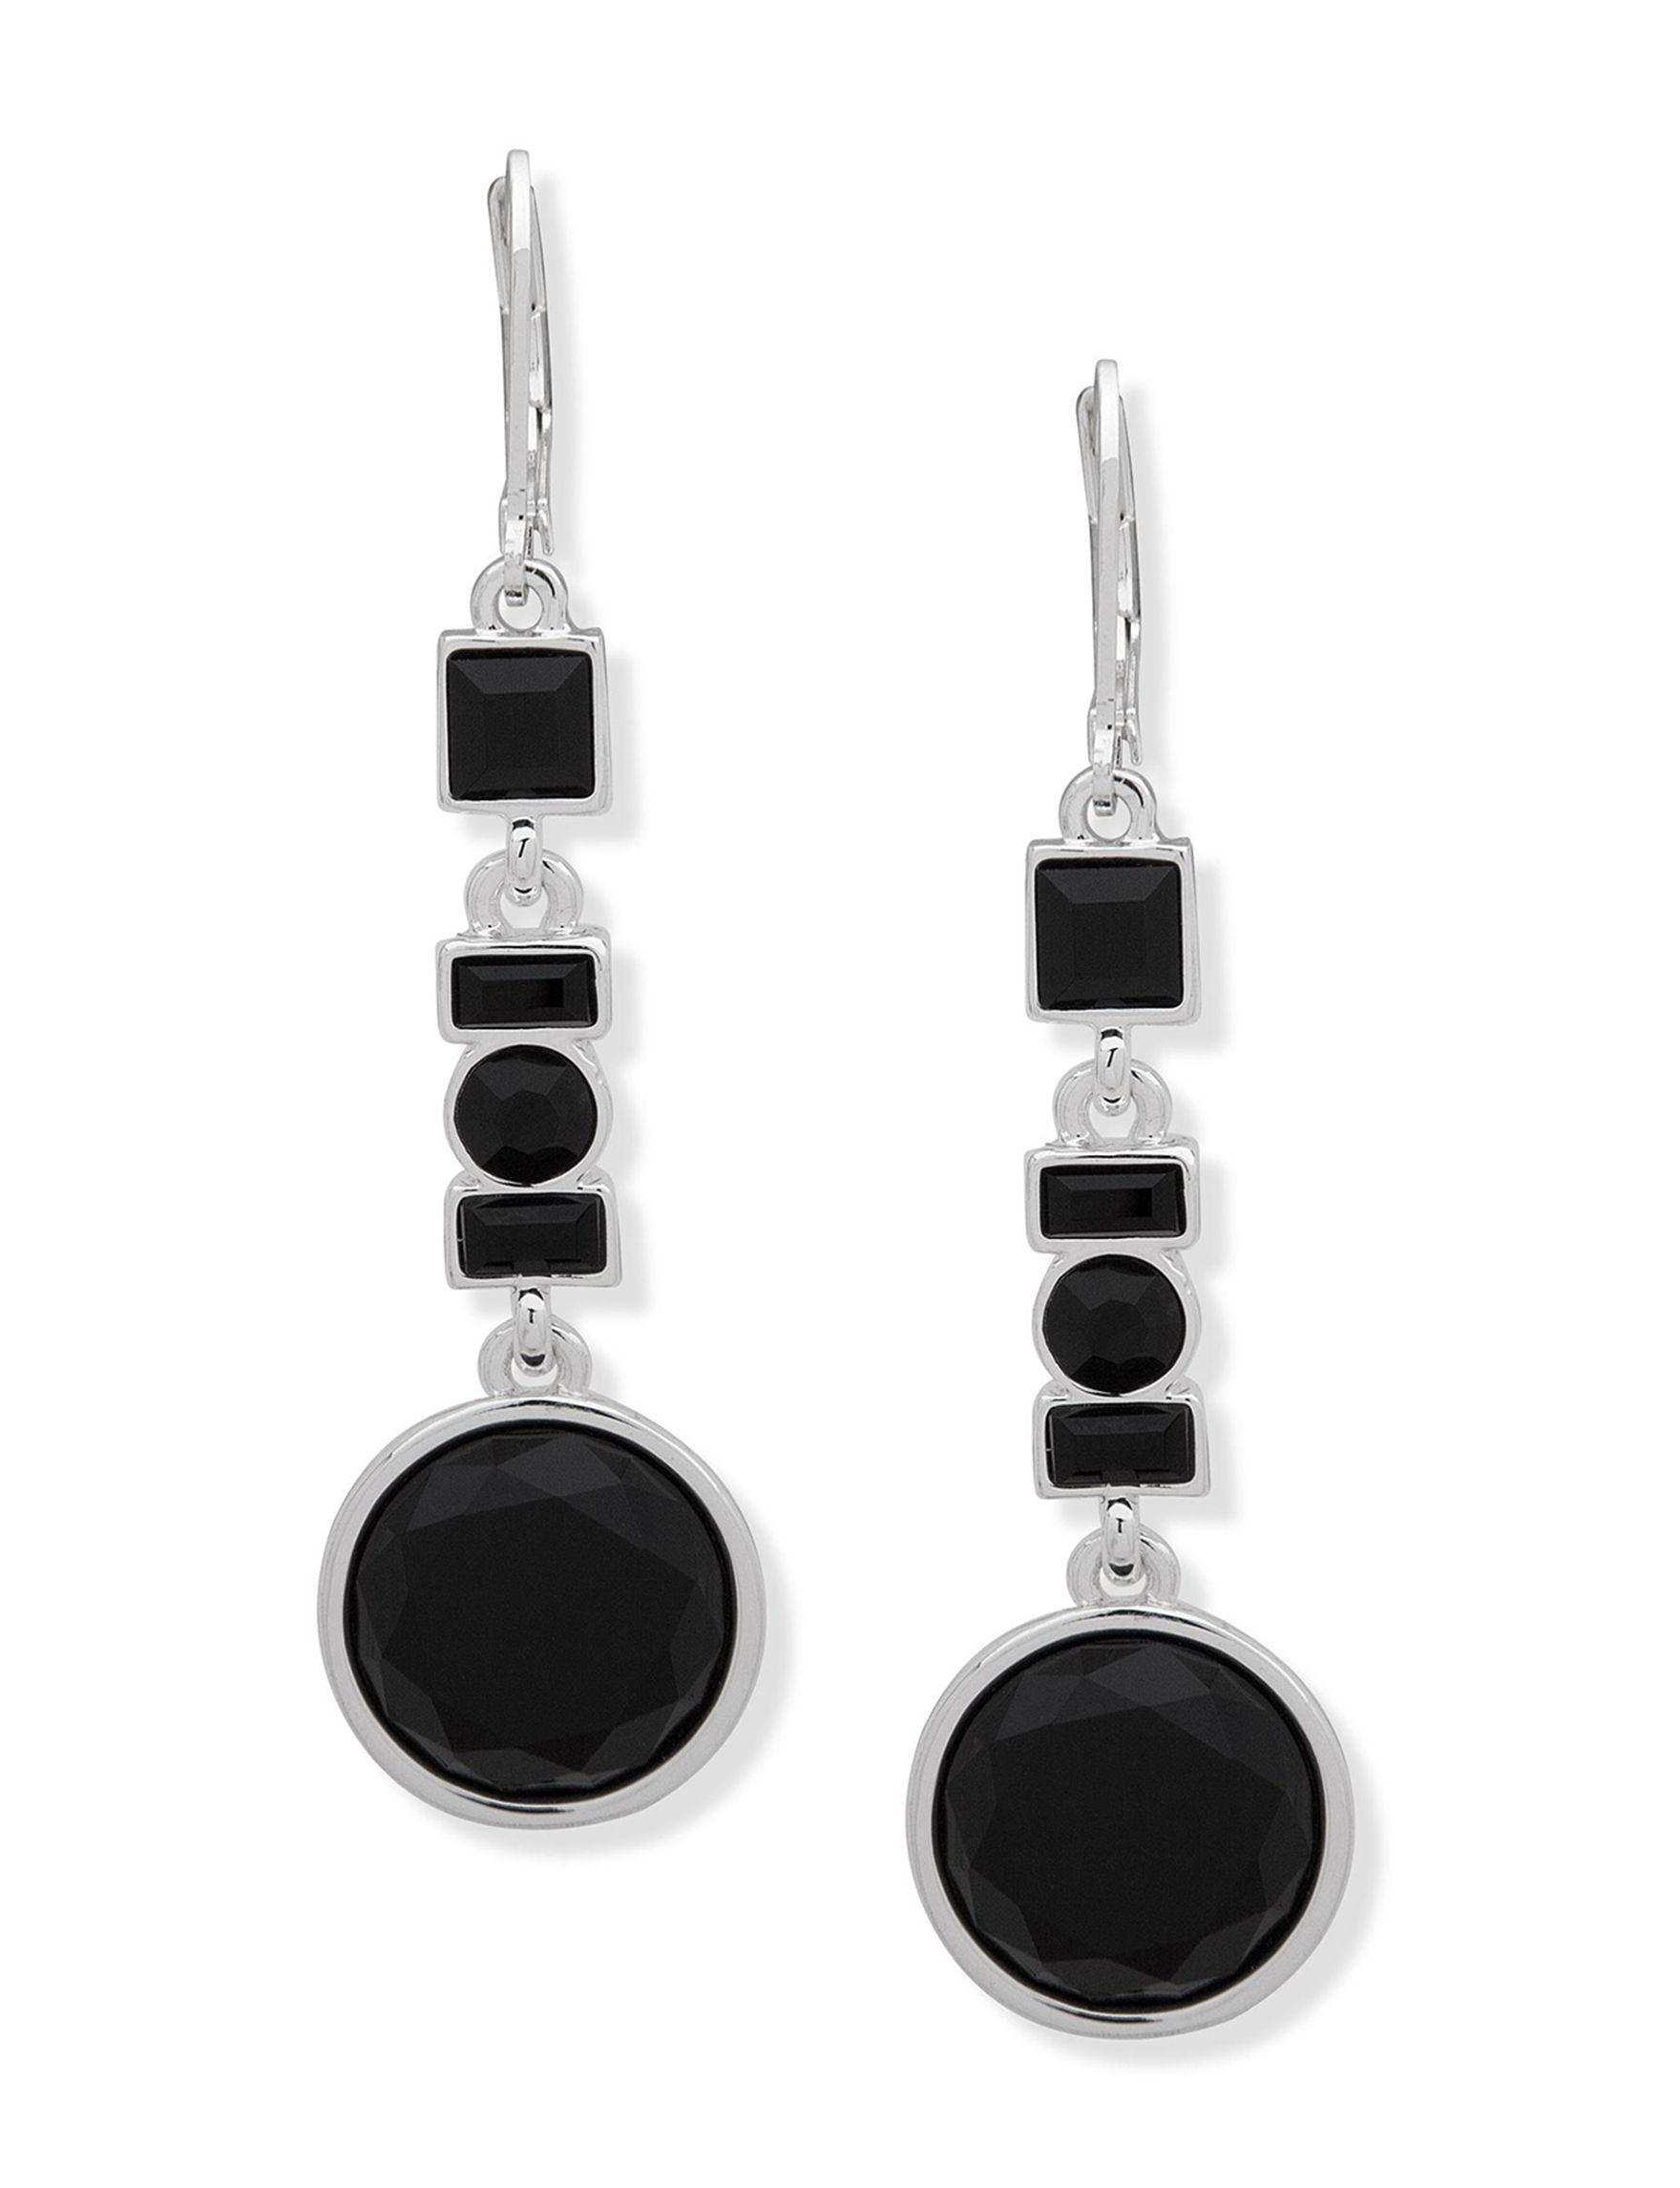 Gloria Vanderbilt Silver / Black Drops Earrings Fashion Jewelry